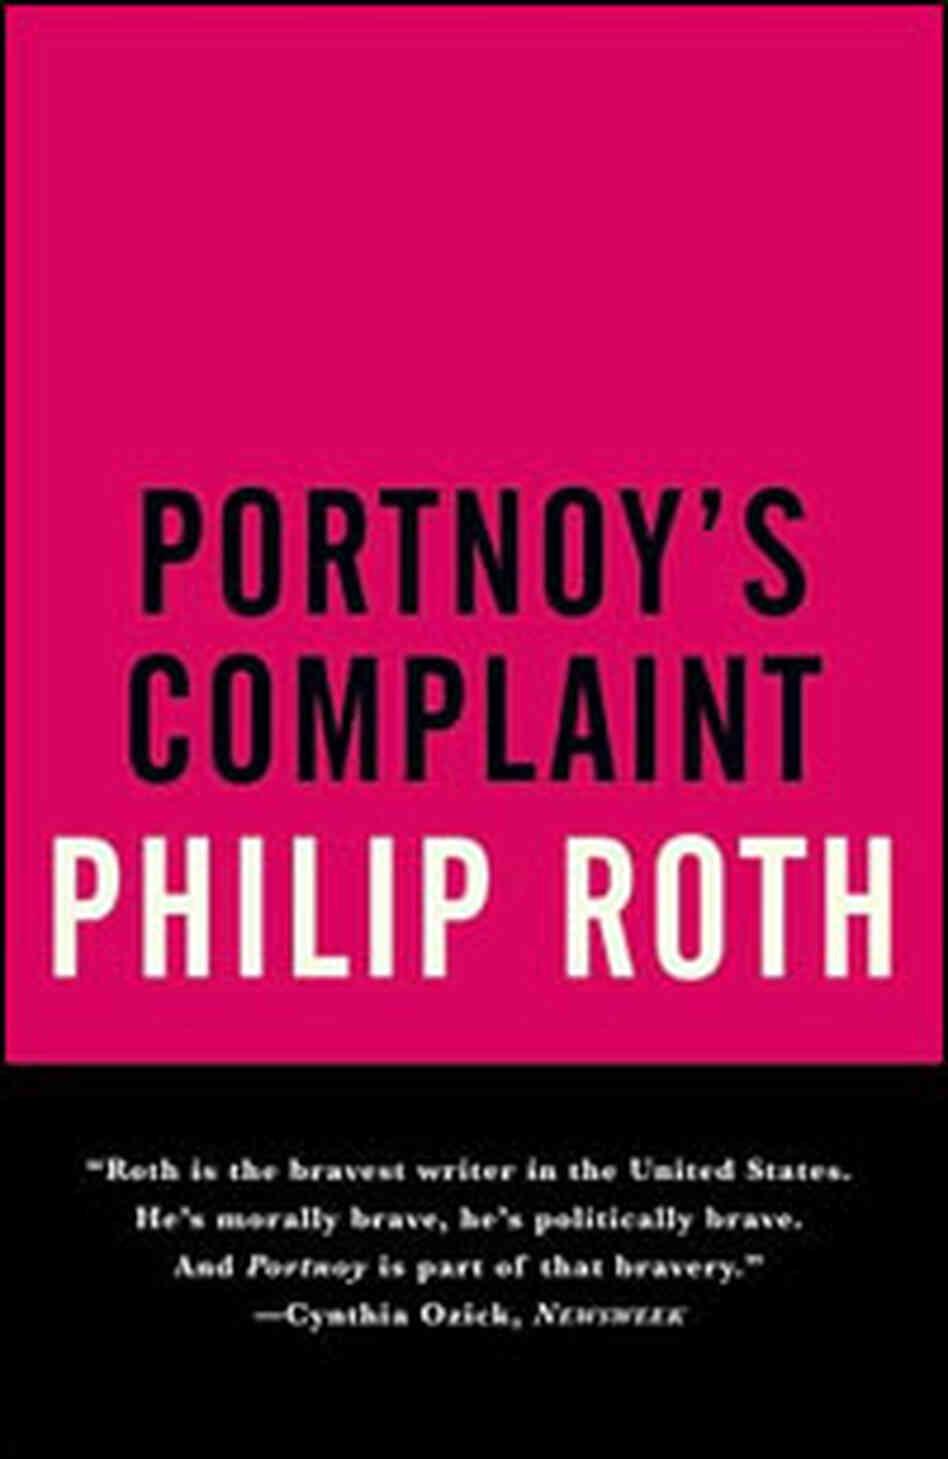 portnoys complaint by philip roth Portnoy's complaint (vintage blue) de philip roth en iberlibrocom - isbn 10: 0099399016 - isbn 13: 9780099399018 - vintage - 1995 - tapa blanda.